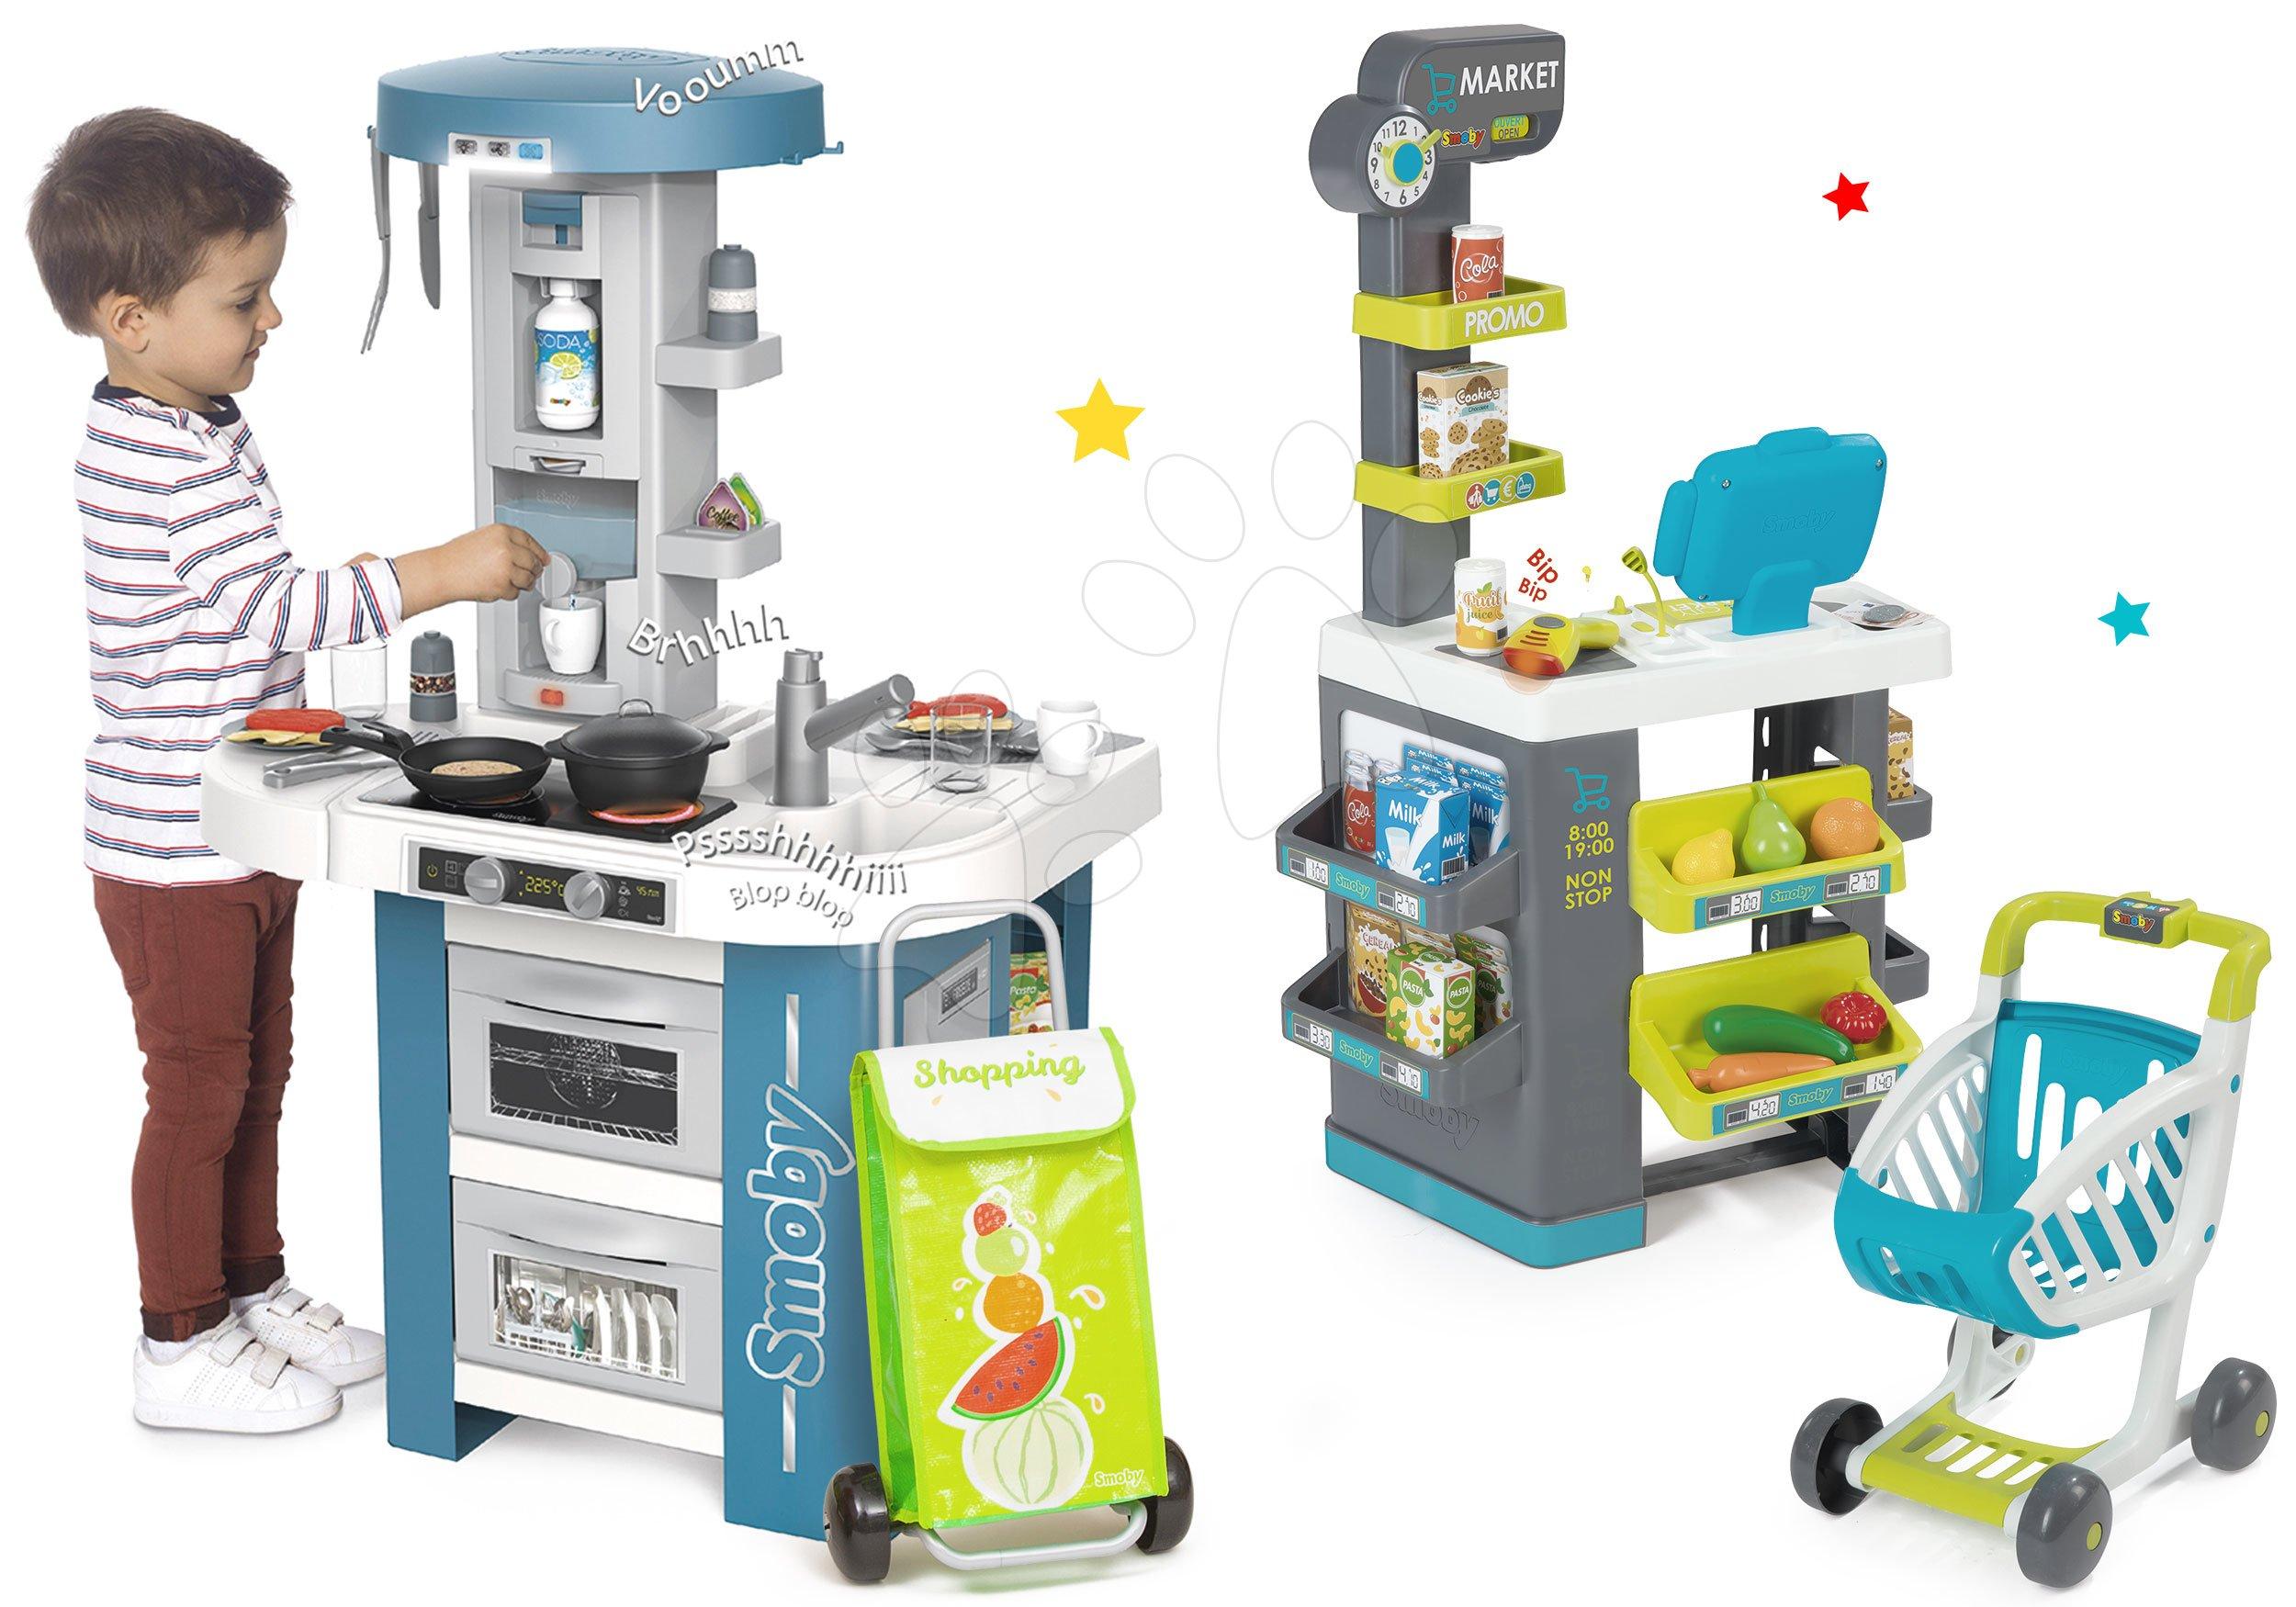 Set kuchynka s technickým vybavením Tech Edition Smoby elektronická s obchodom s rozličným tovarom a nákupnou taškou